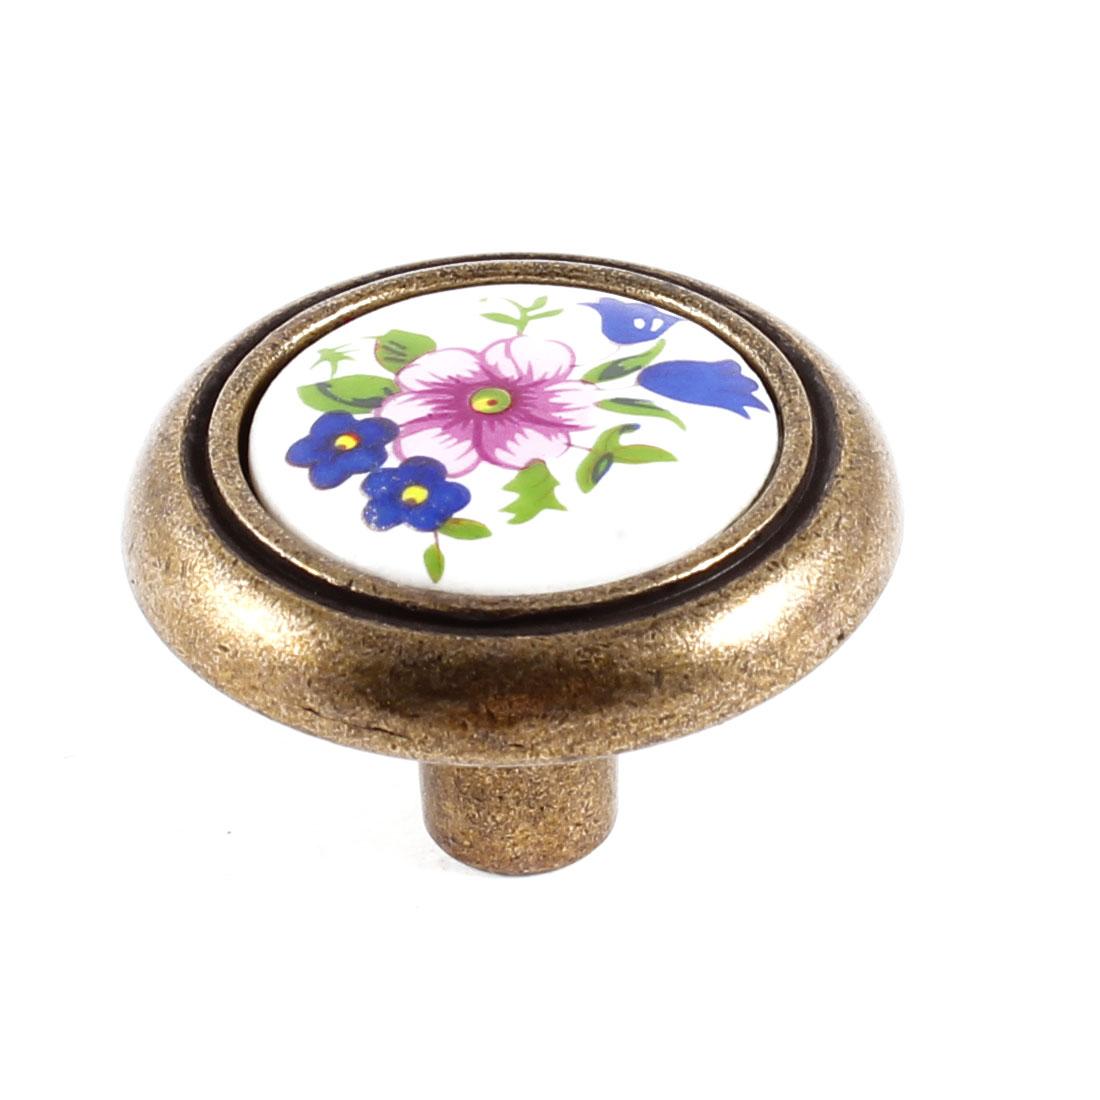 "Bedroom 0.14"" Dia Thread Floral Print Ceramic Door Pull Handle Drawer Knob"